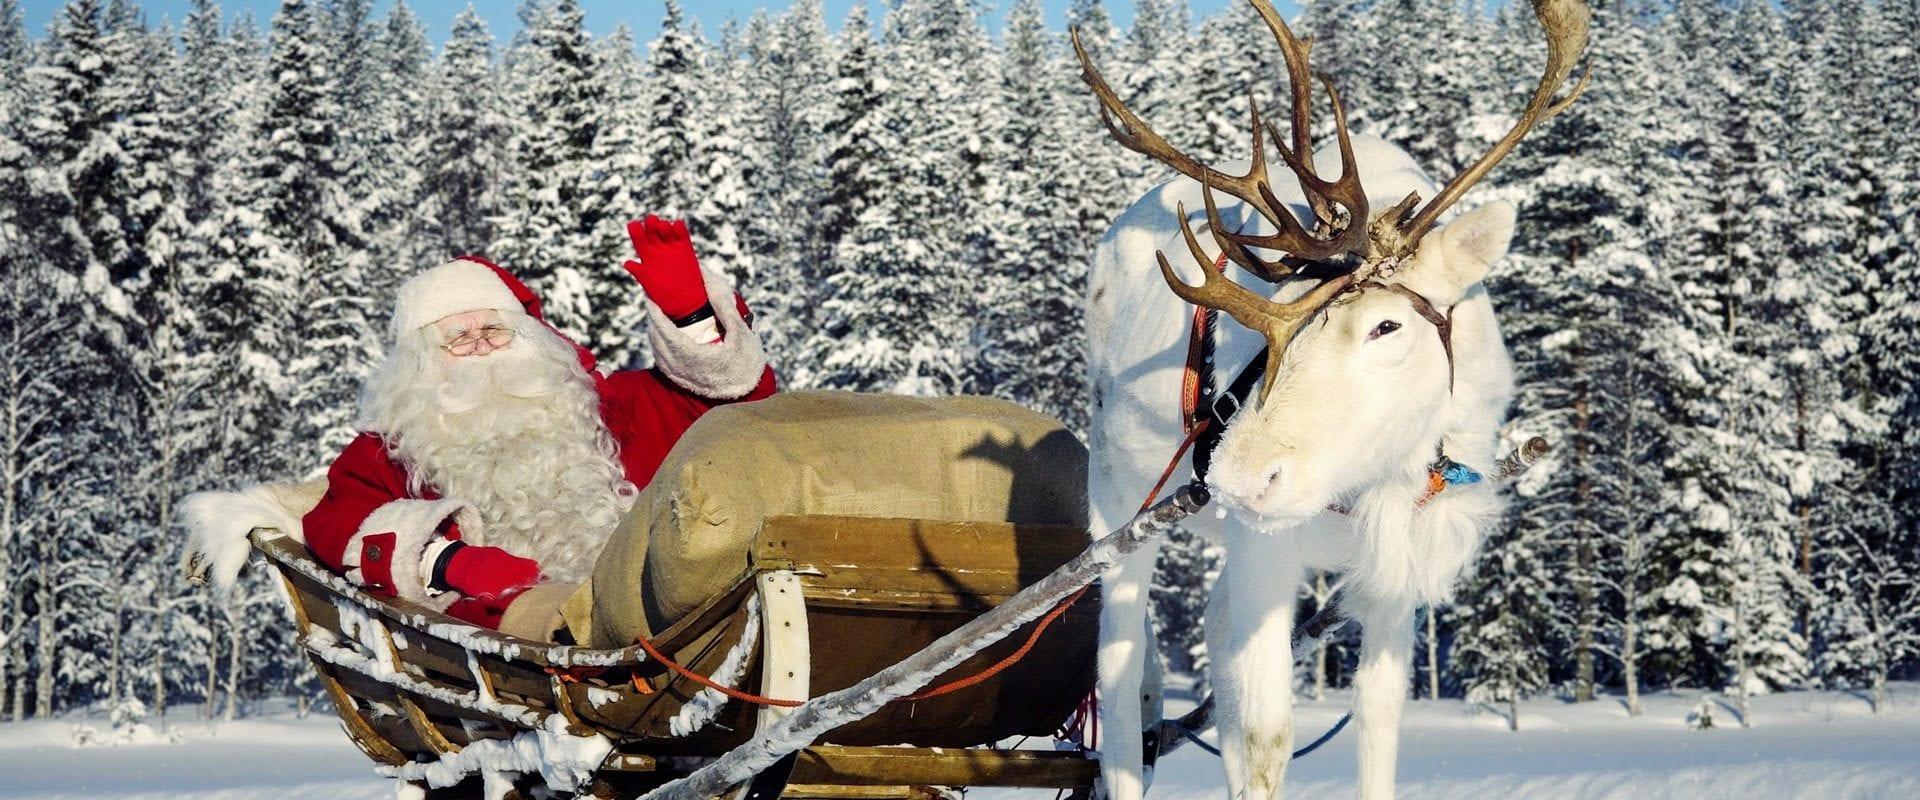 A Rena Mais Famosa Do Papai Noel pacote lendas de natal na lapônia com papai noel  trains